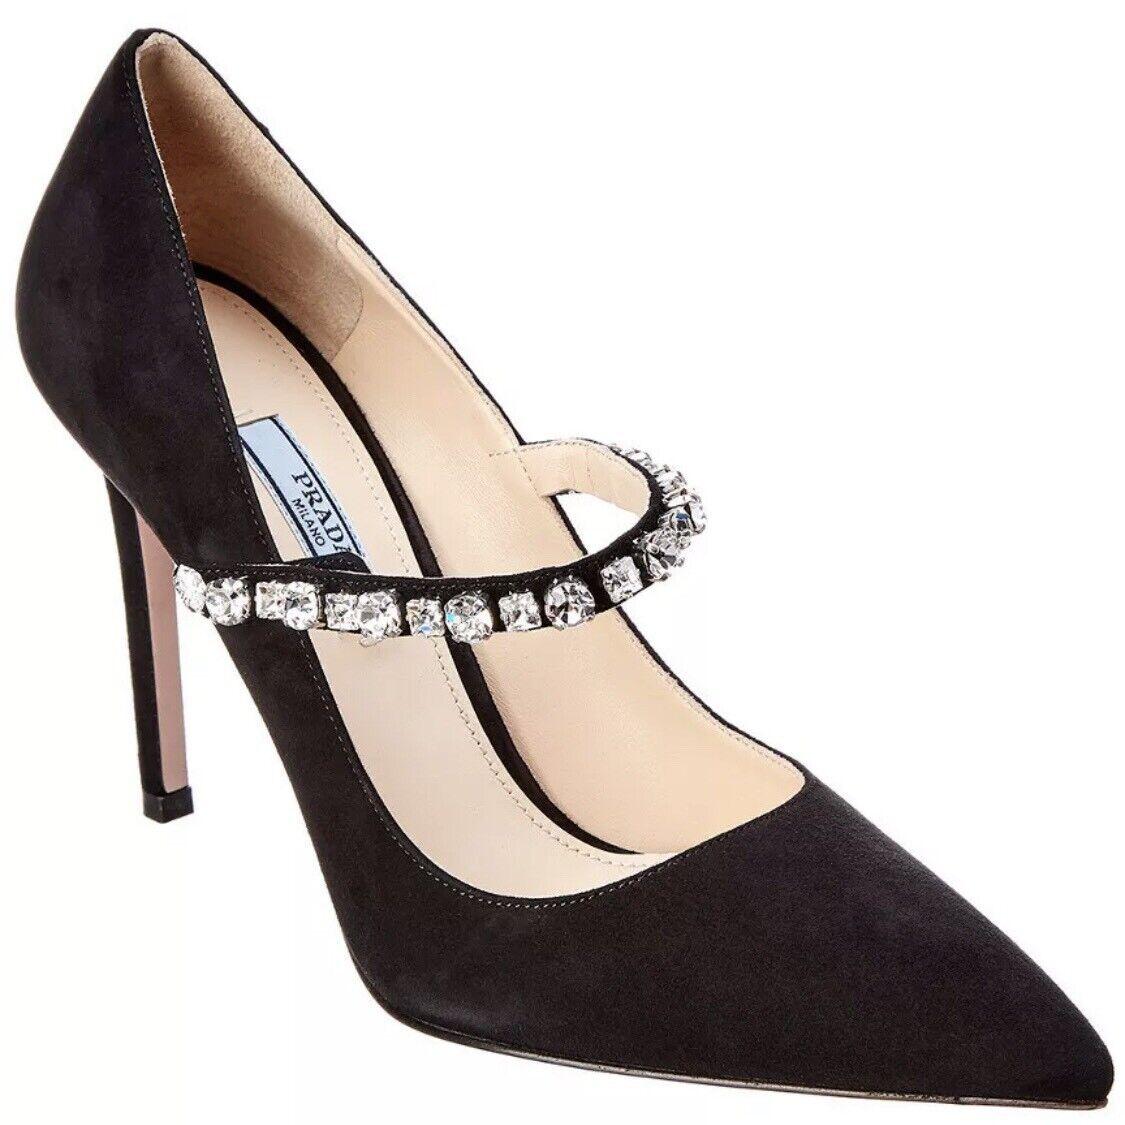 PRADA Crystal  Emellited Sue Pump Heels NIB  sconto prezzo basso